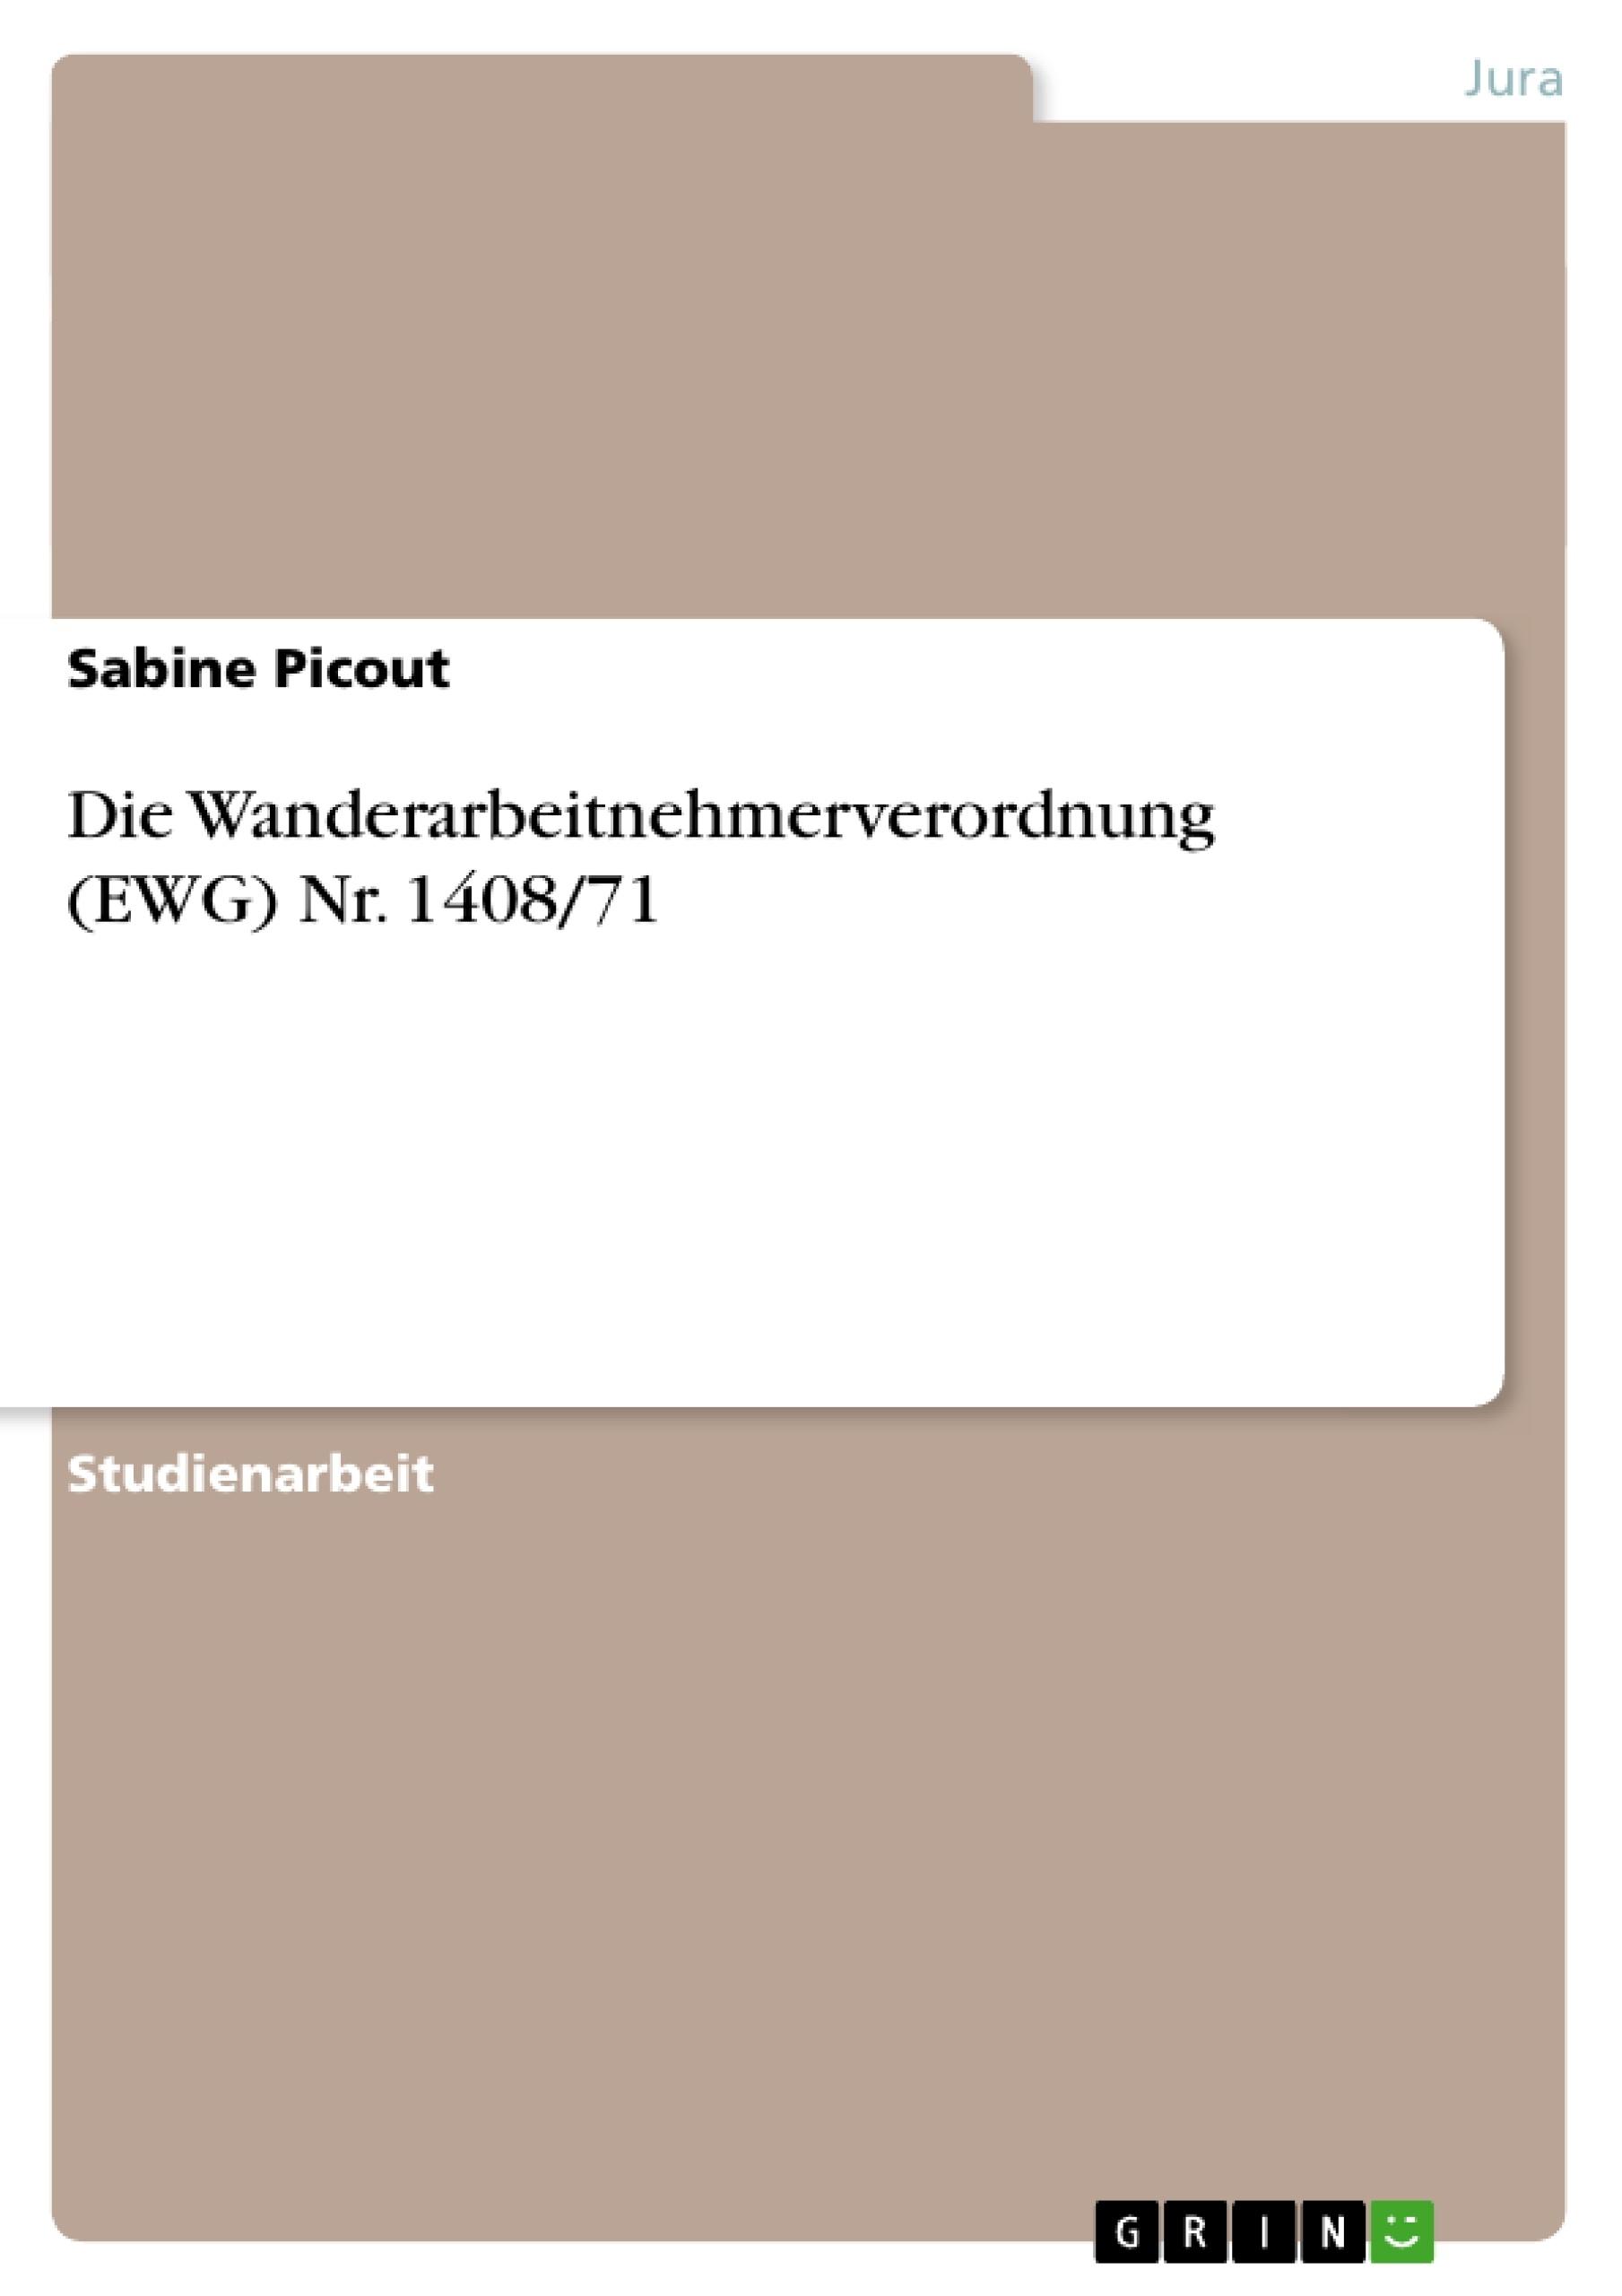 Titel: Die Wanderarbeitnehmerverordnung (EWG) Nr. 1408/71